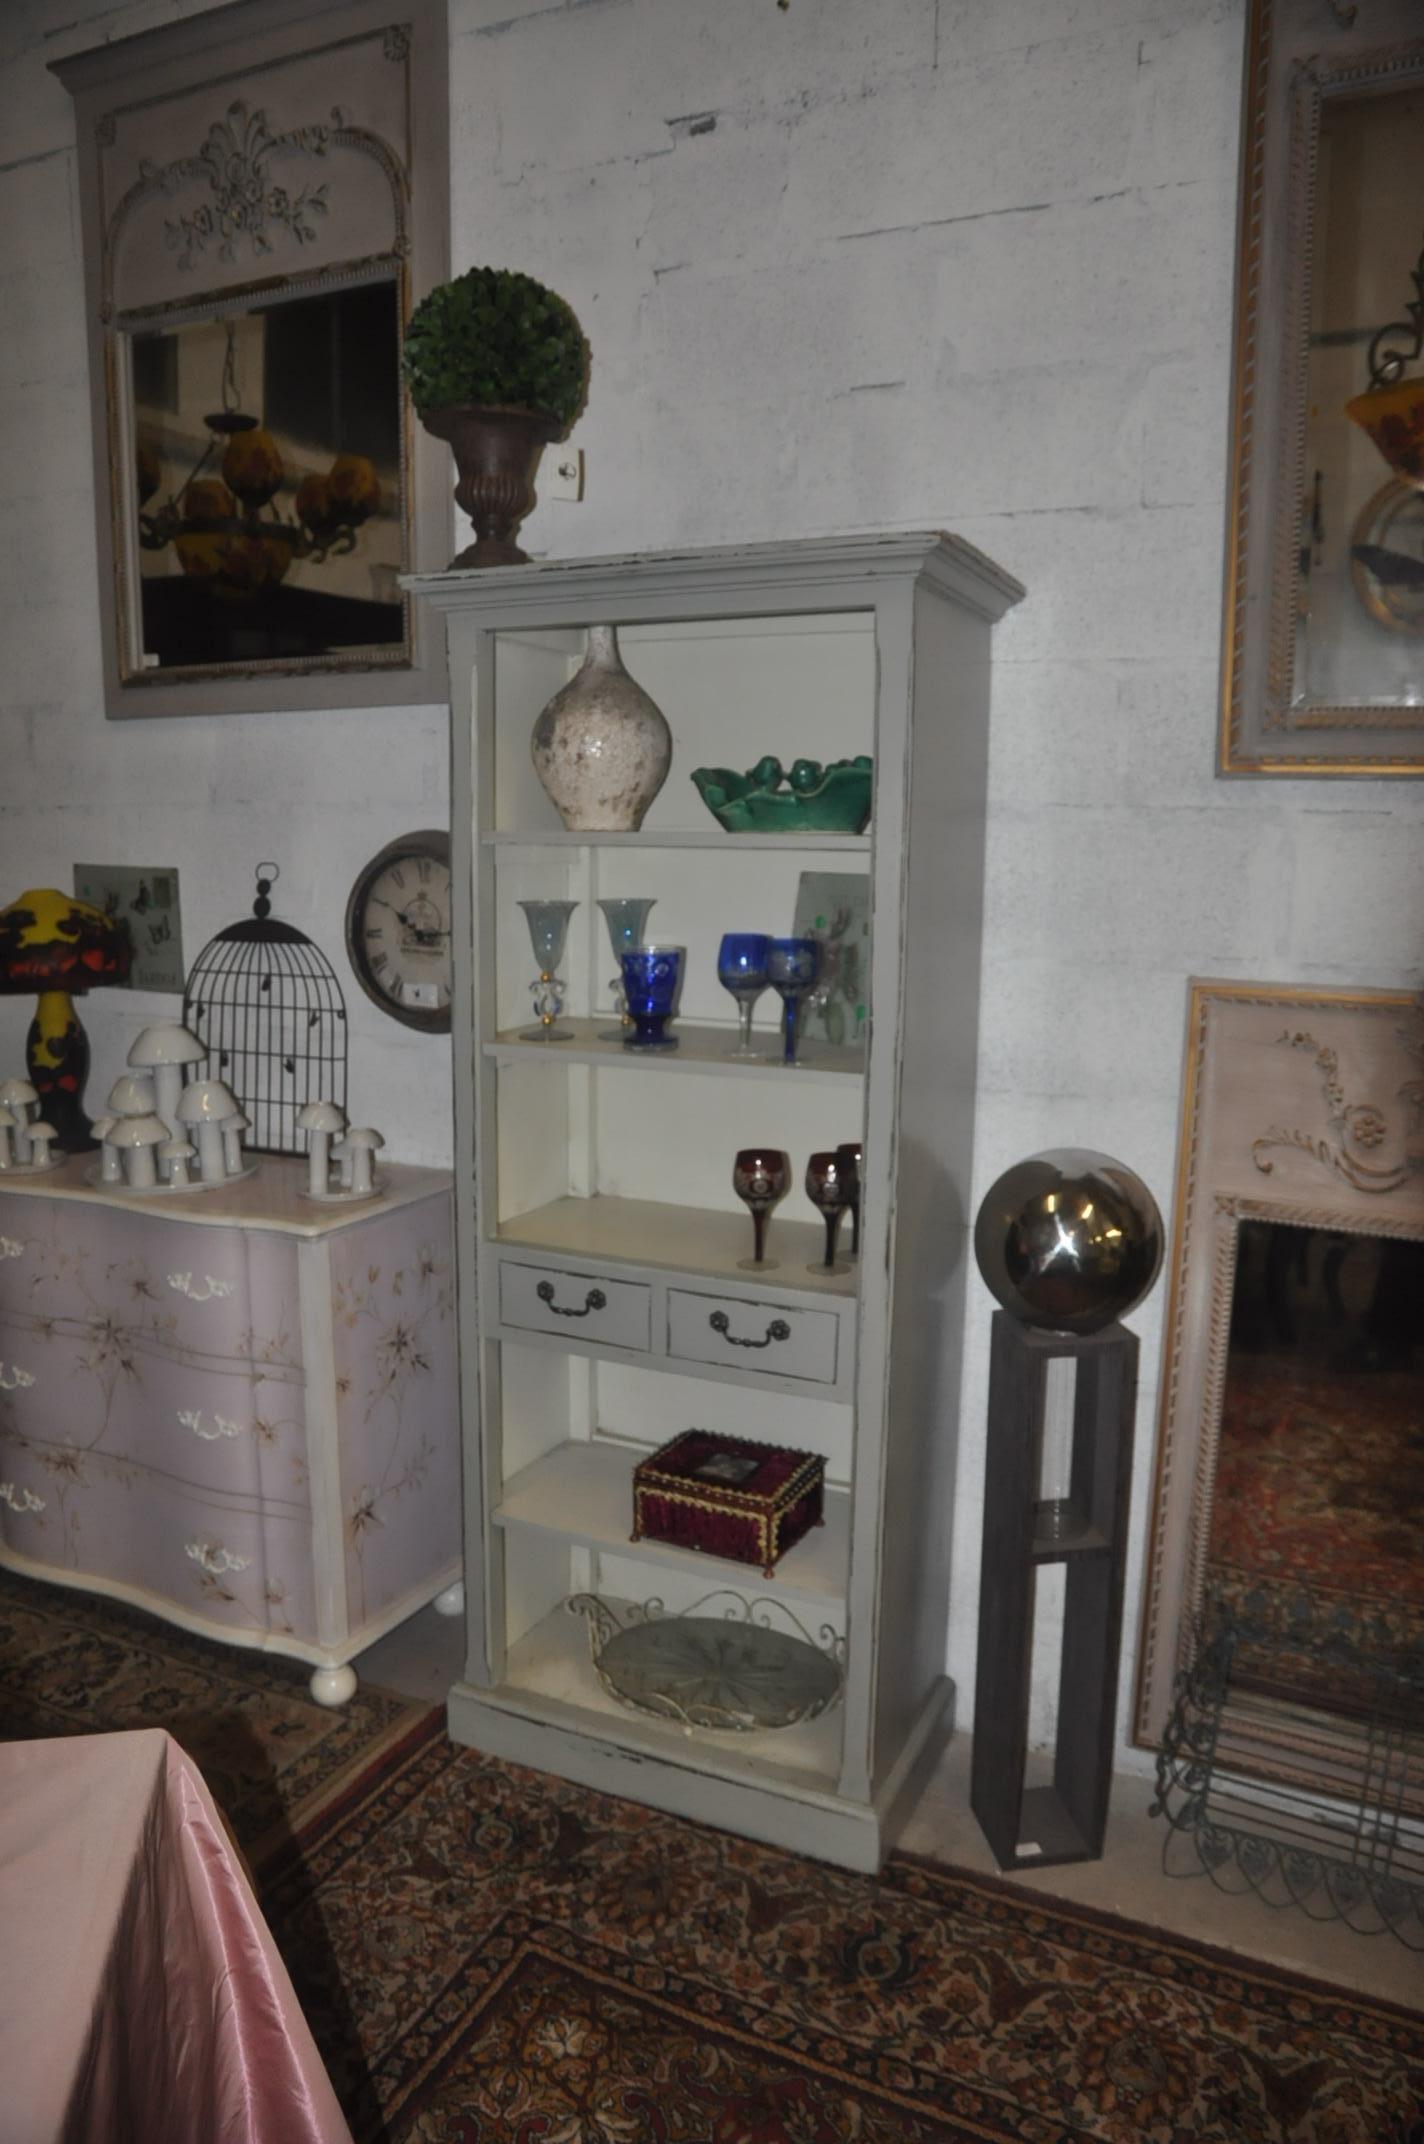 petite biblioth que patine grise int rieure blanche. Black Bedroom Furniture Sets. Home Design Ideas